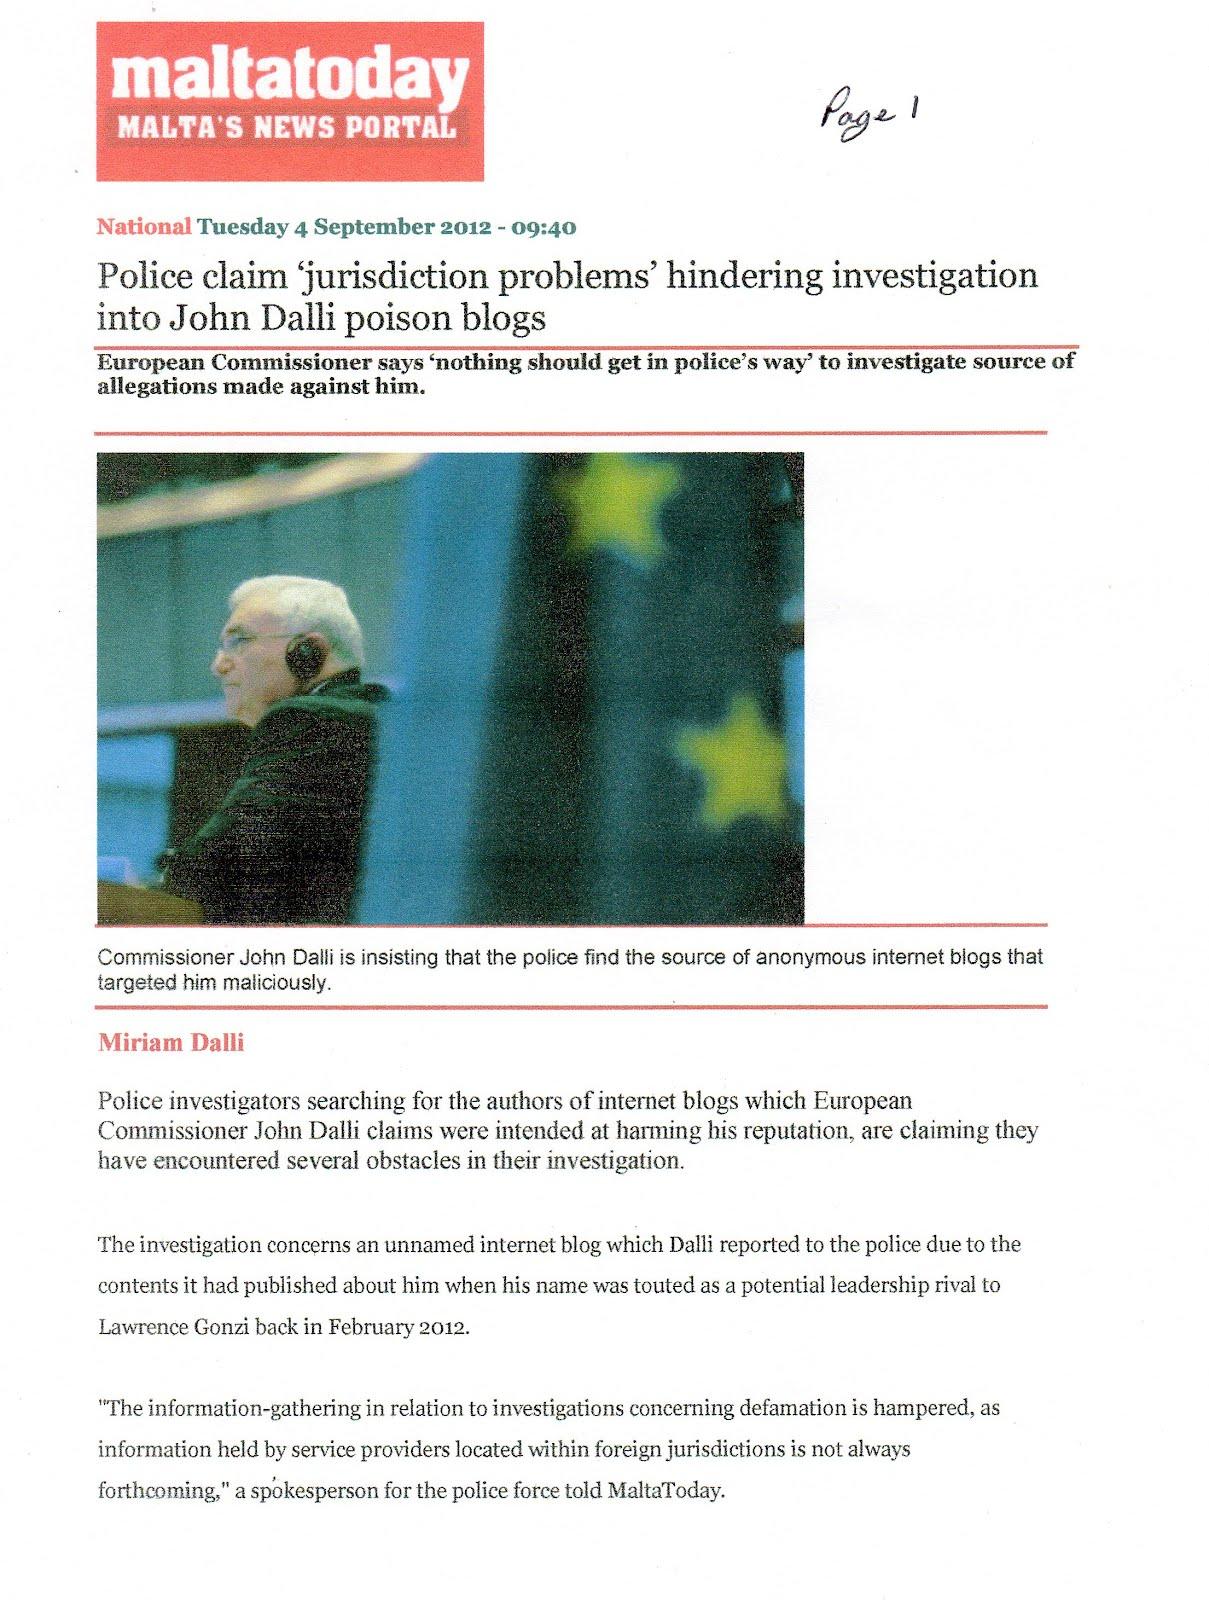 P1 - John Dalli Reports Blogs To Police